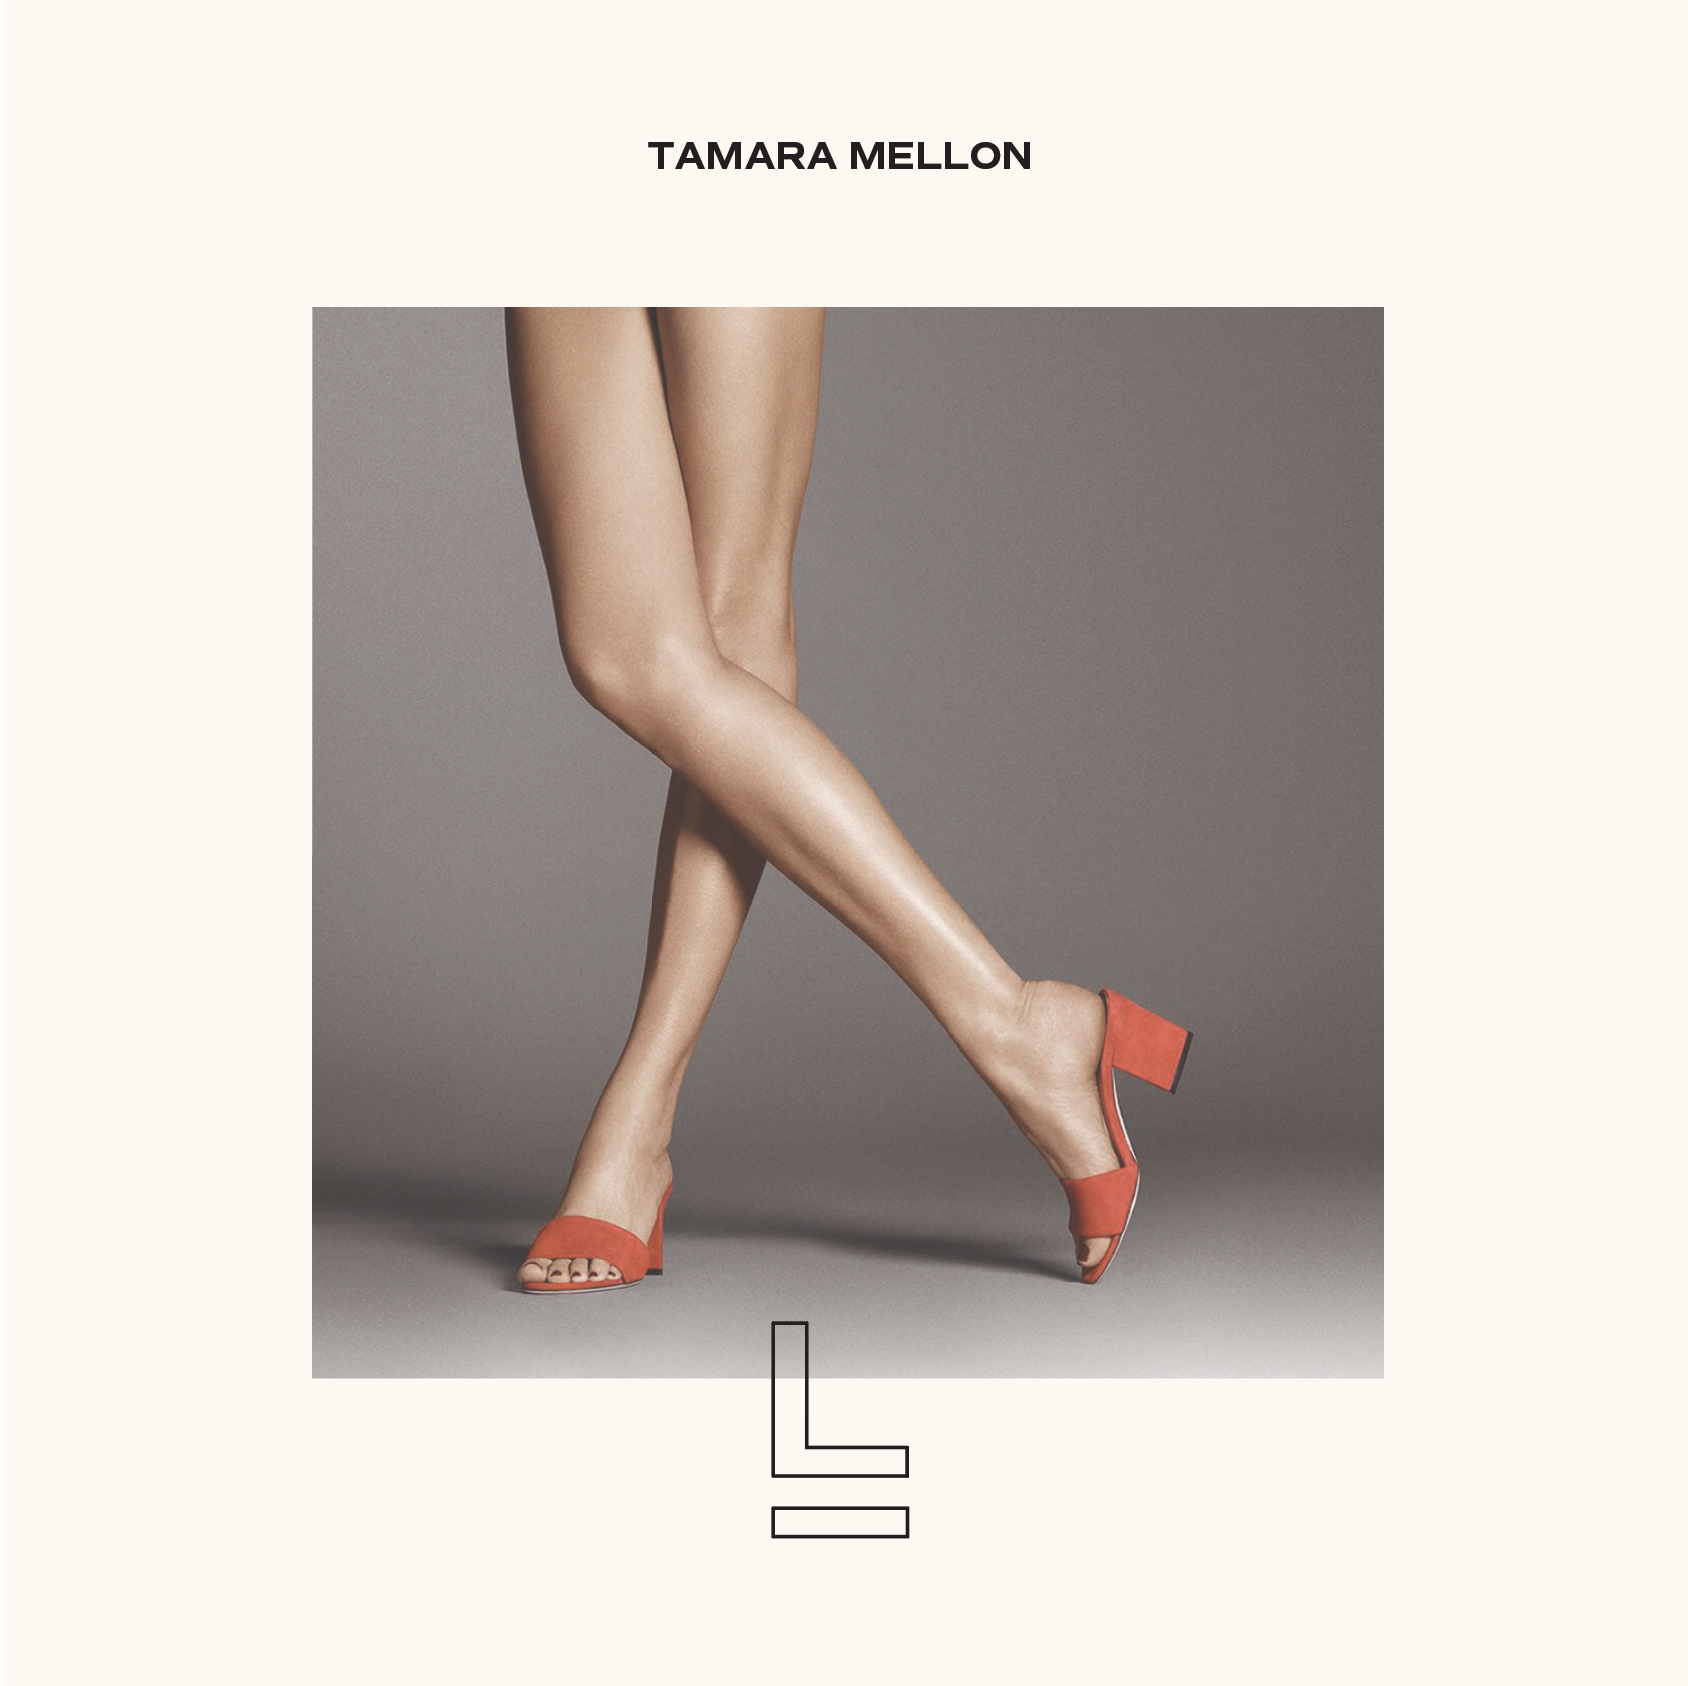 Levitate_Tamara-Mellon